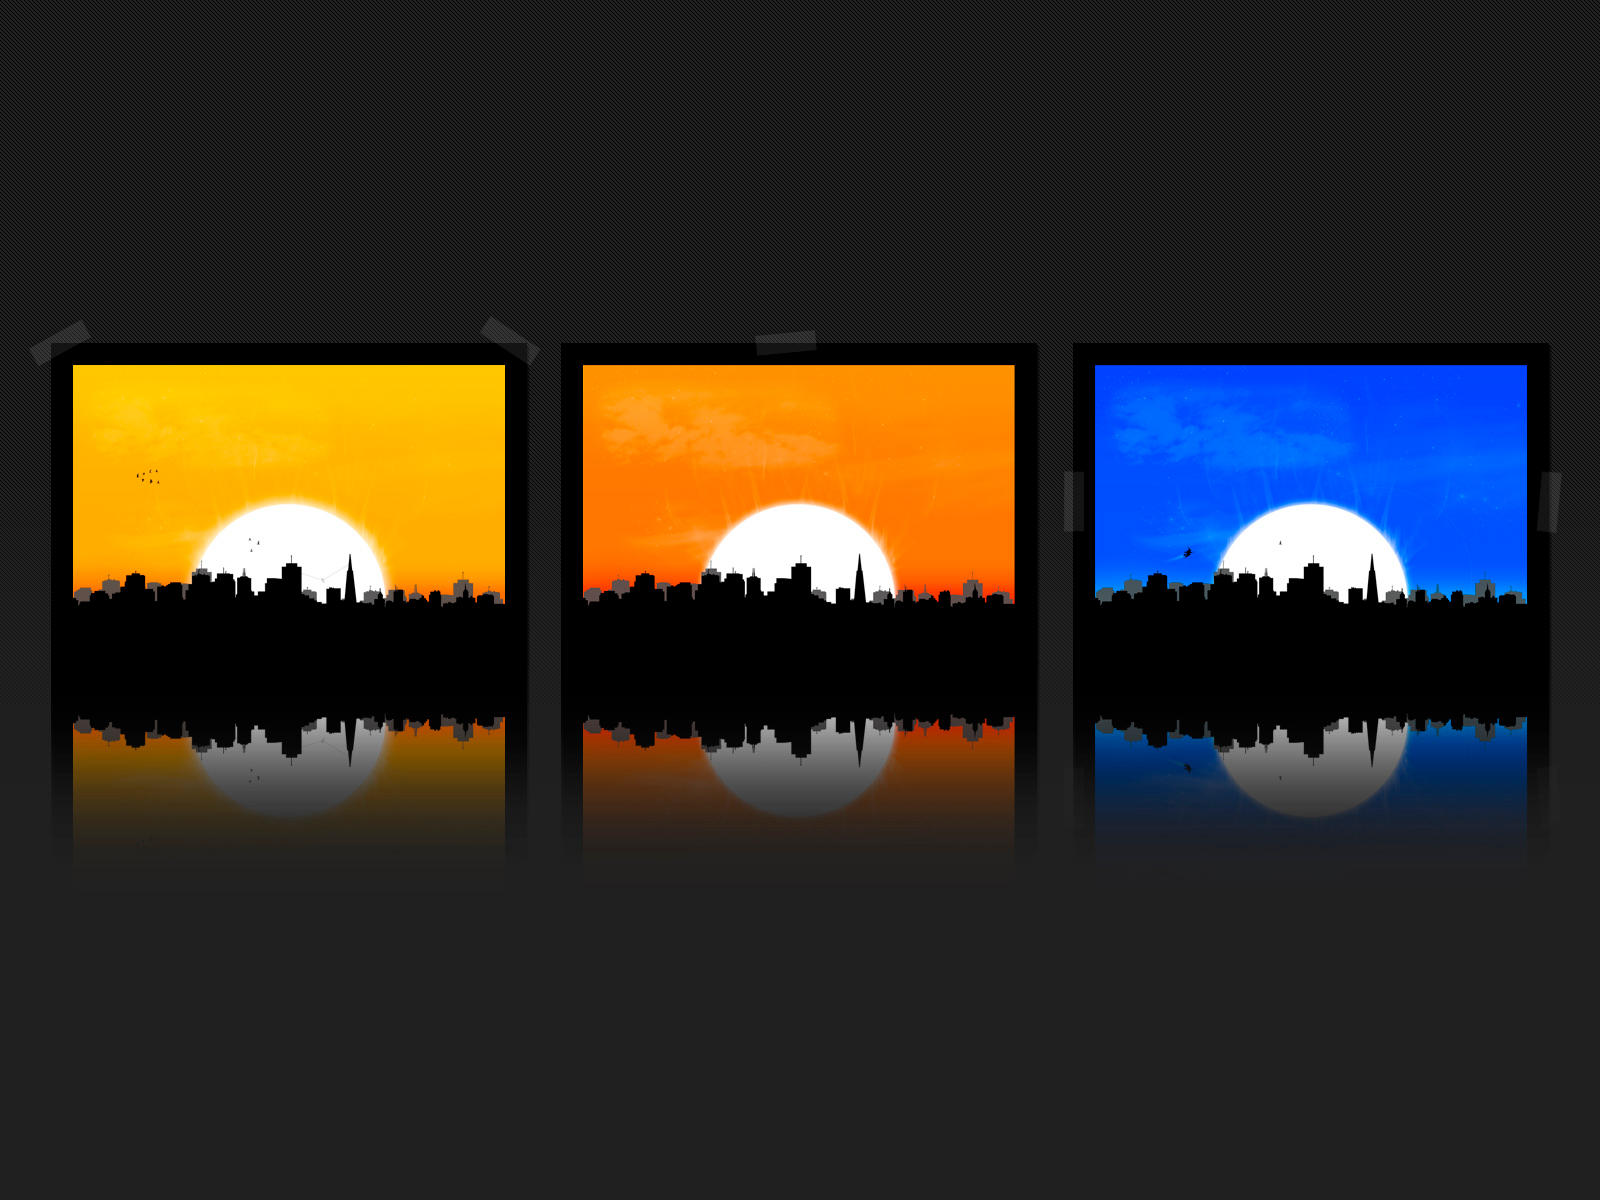 SeasonsWP by grevenlx